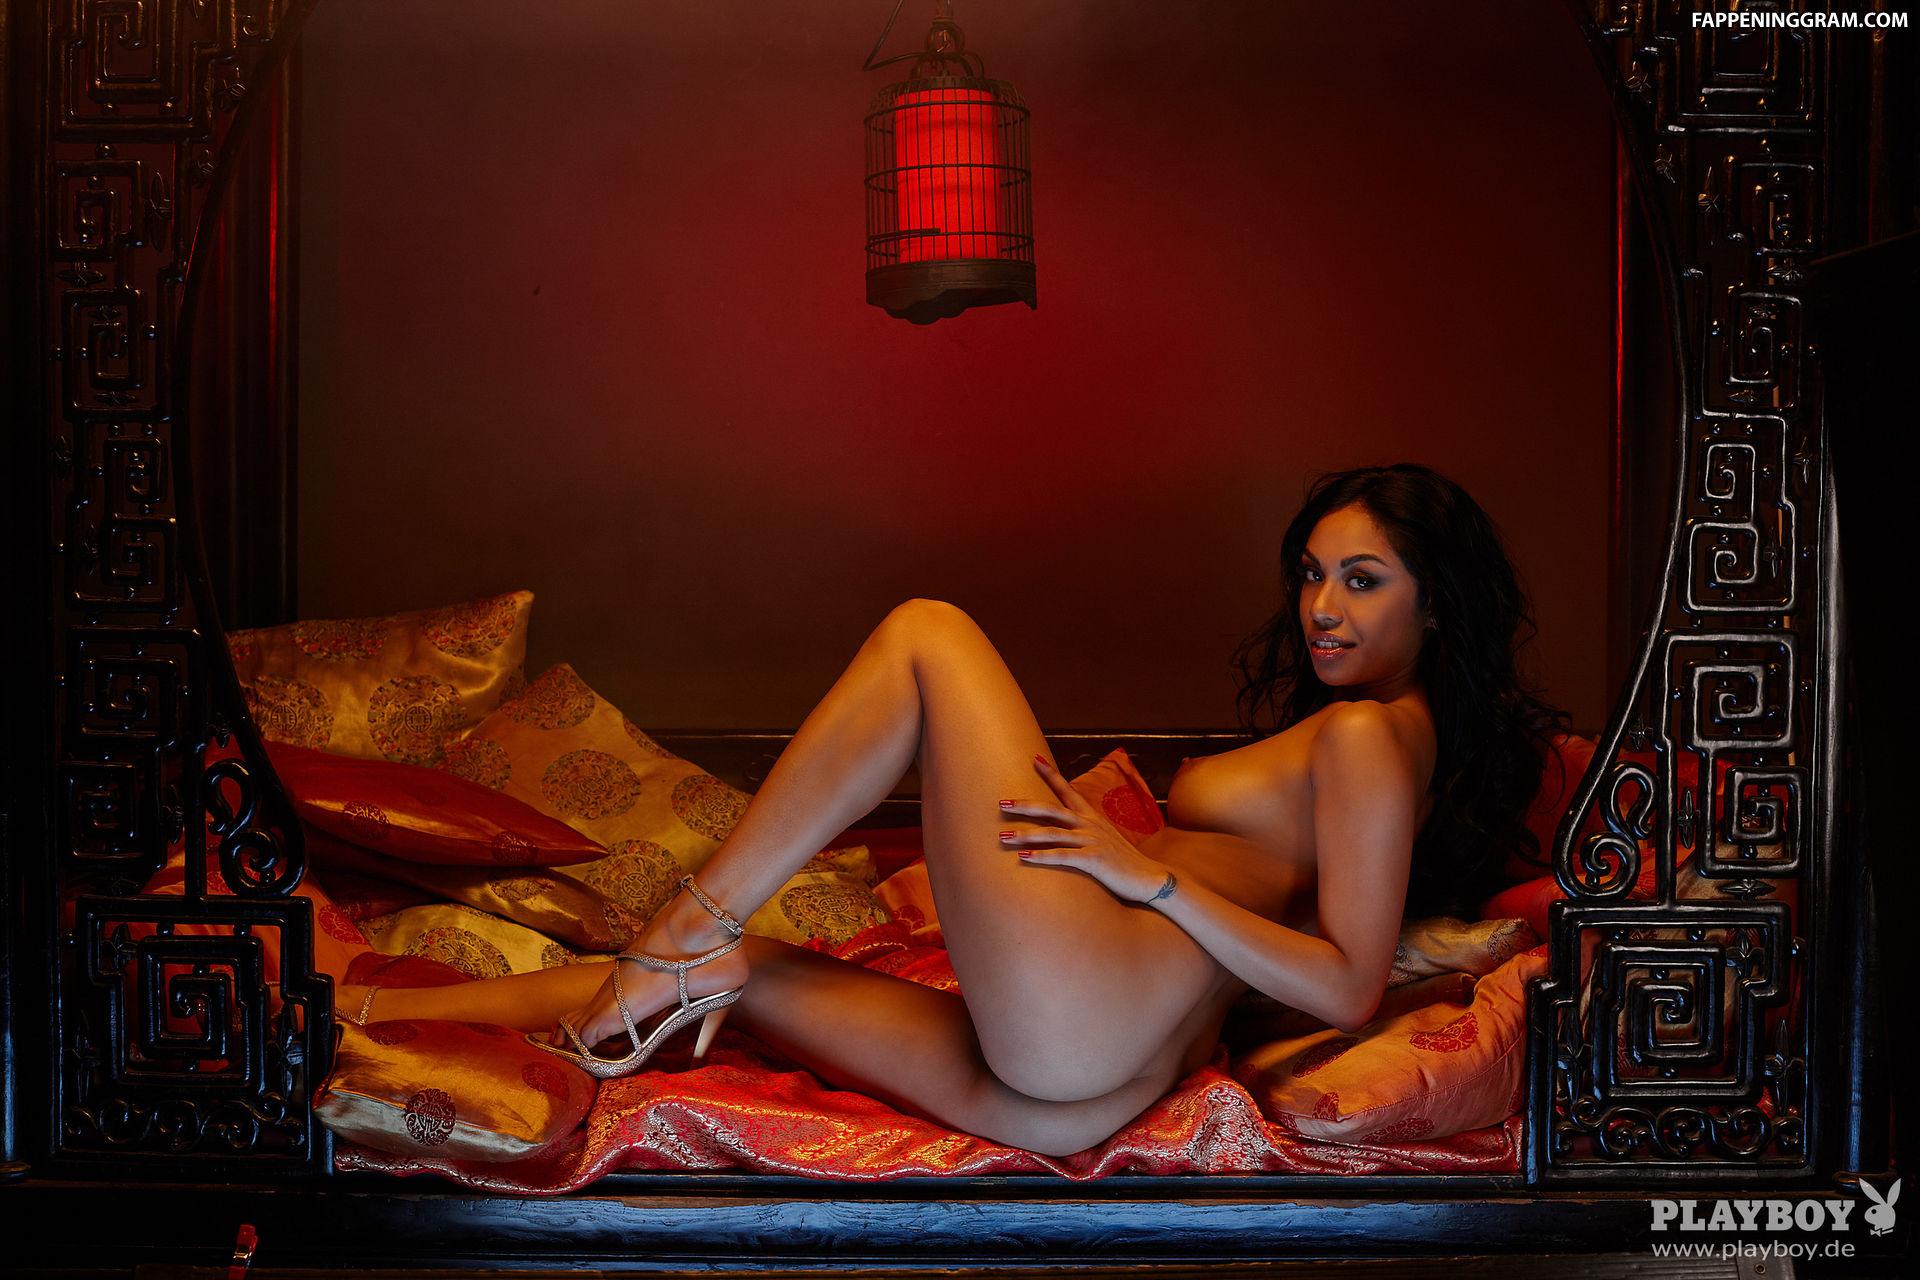 Althea vega free sex pics